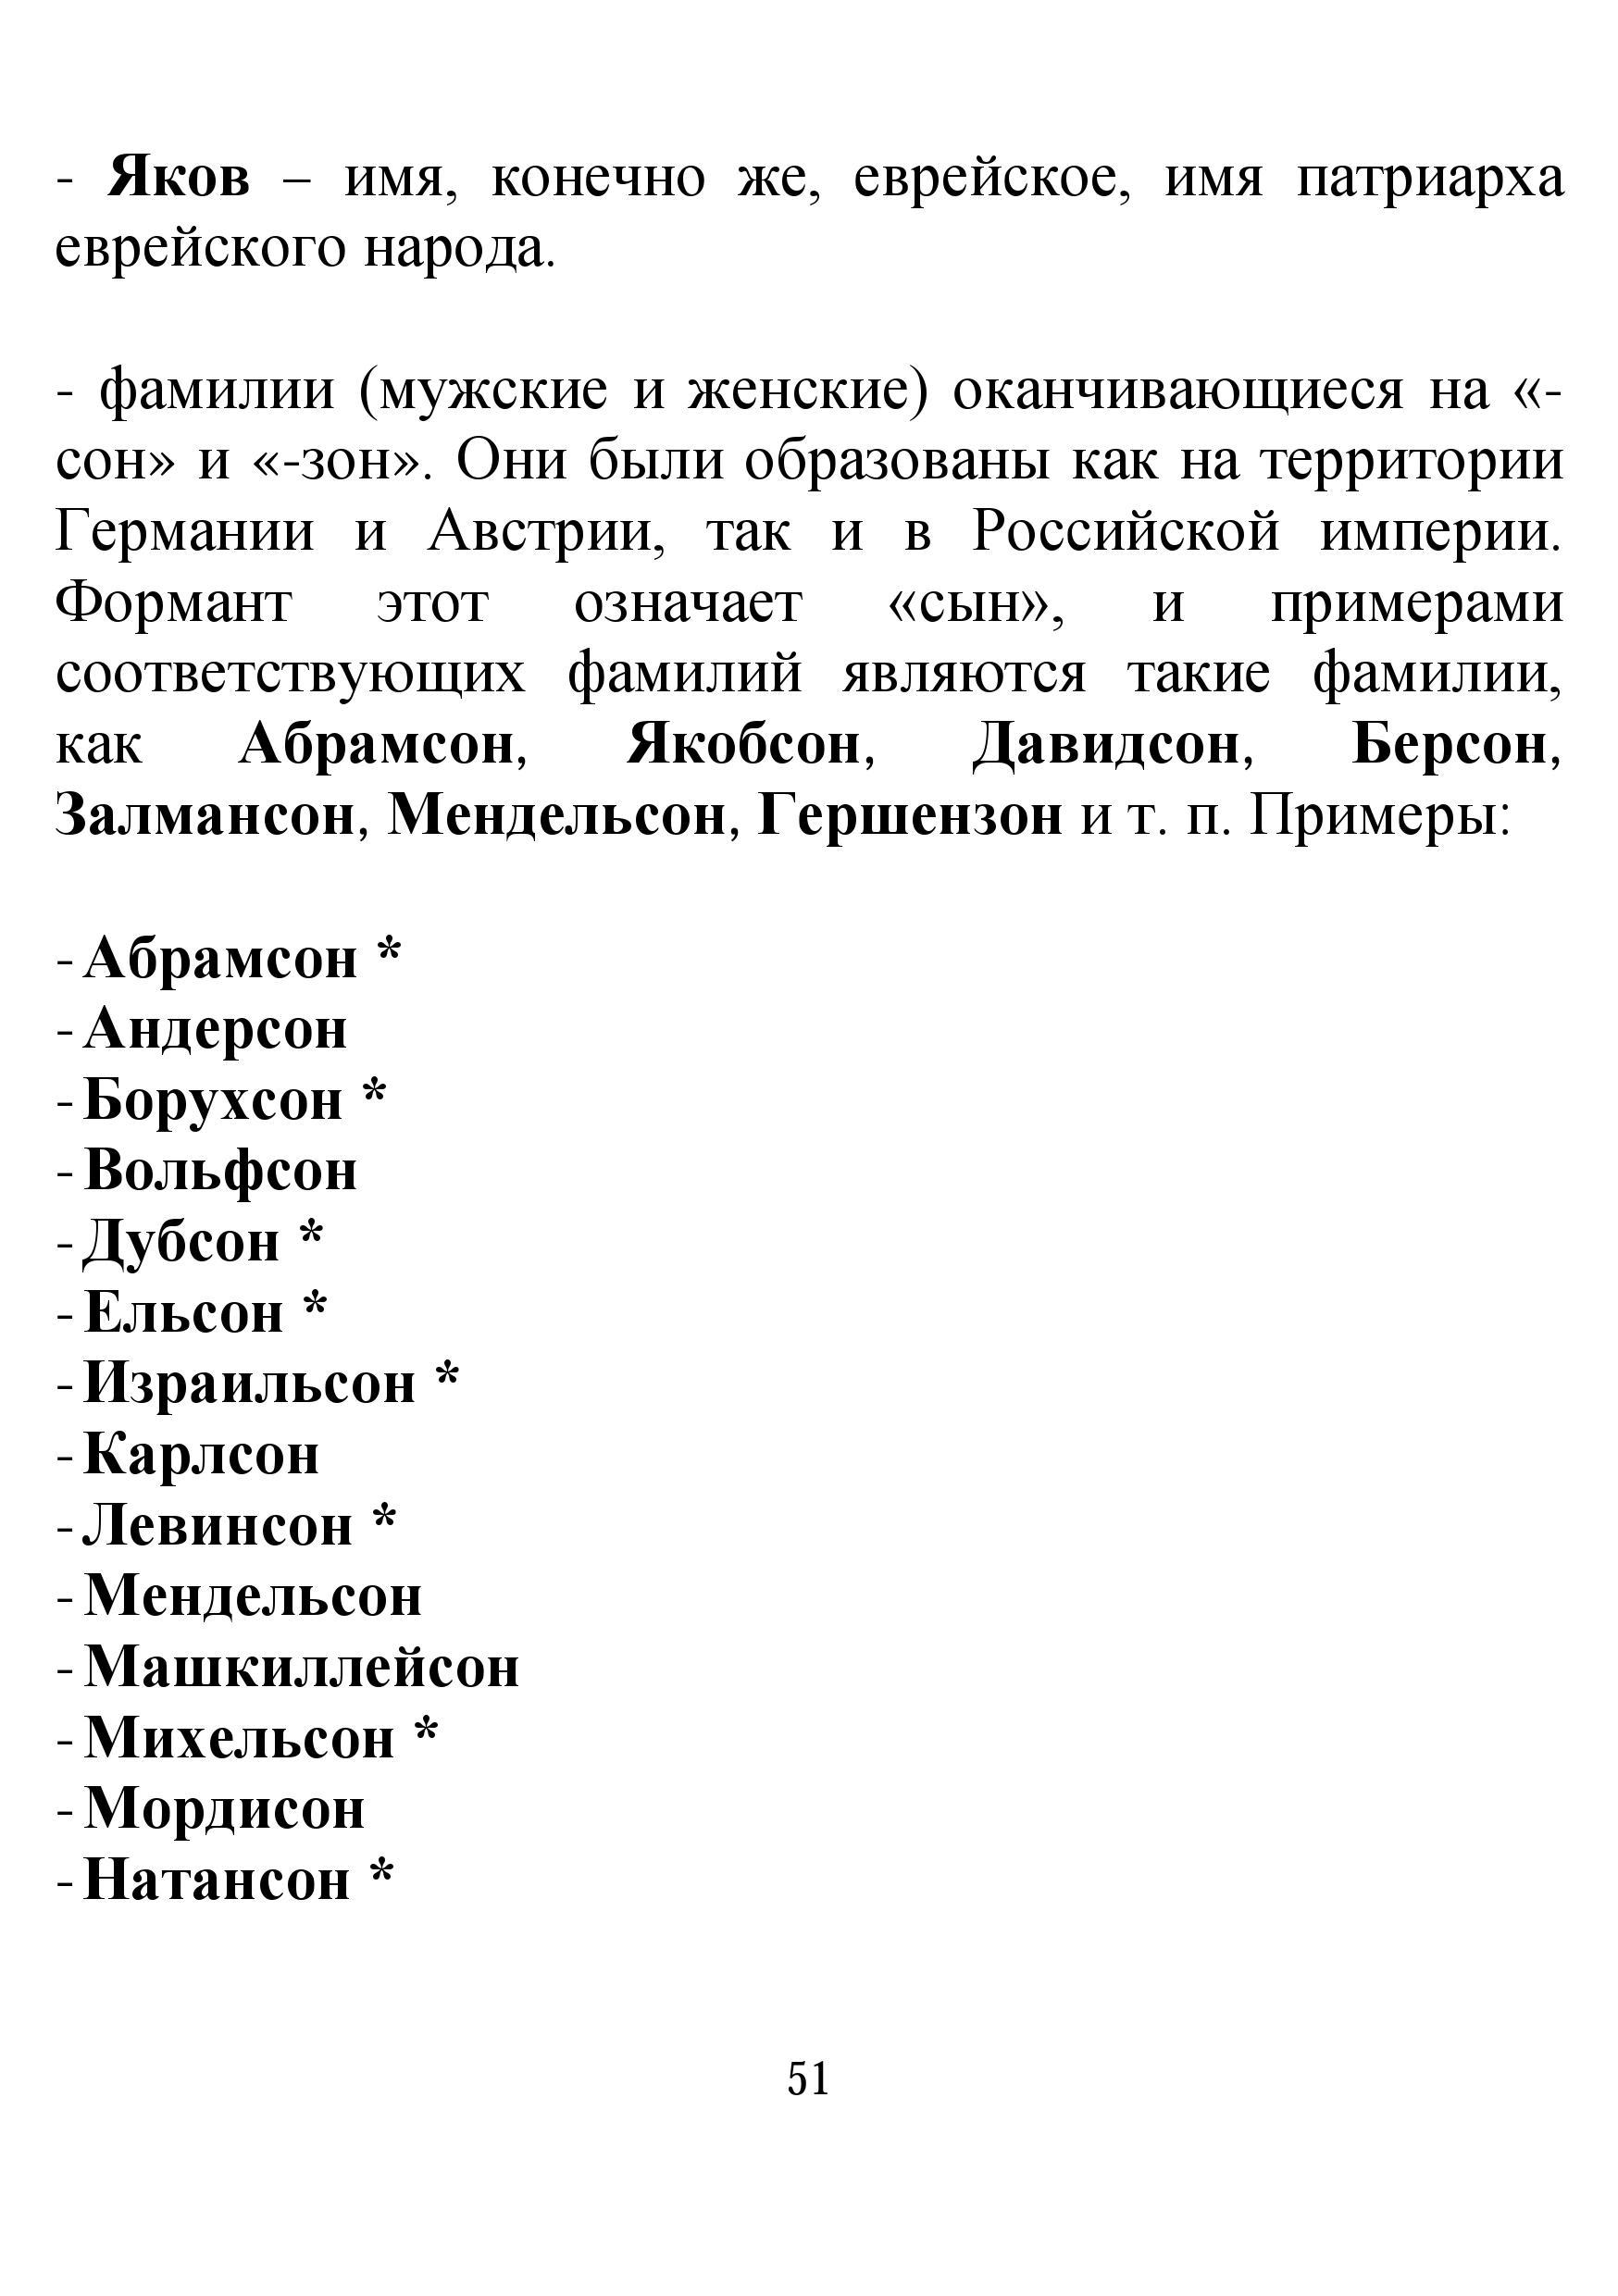 http://s5.uploads.ru/n1kdq.jpg